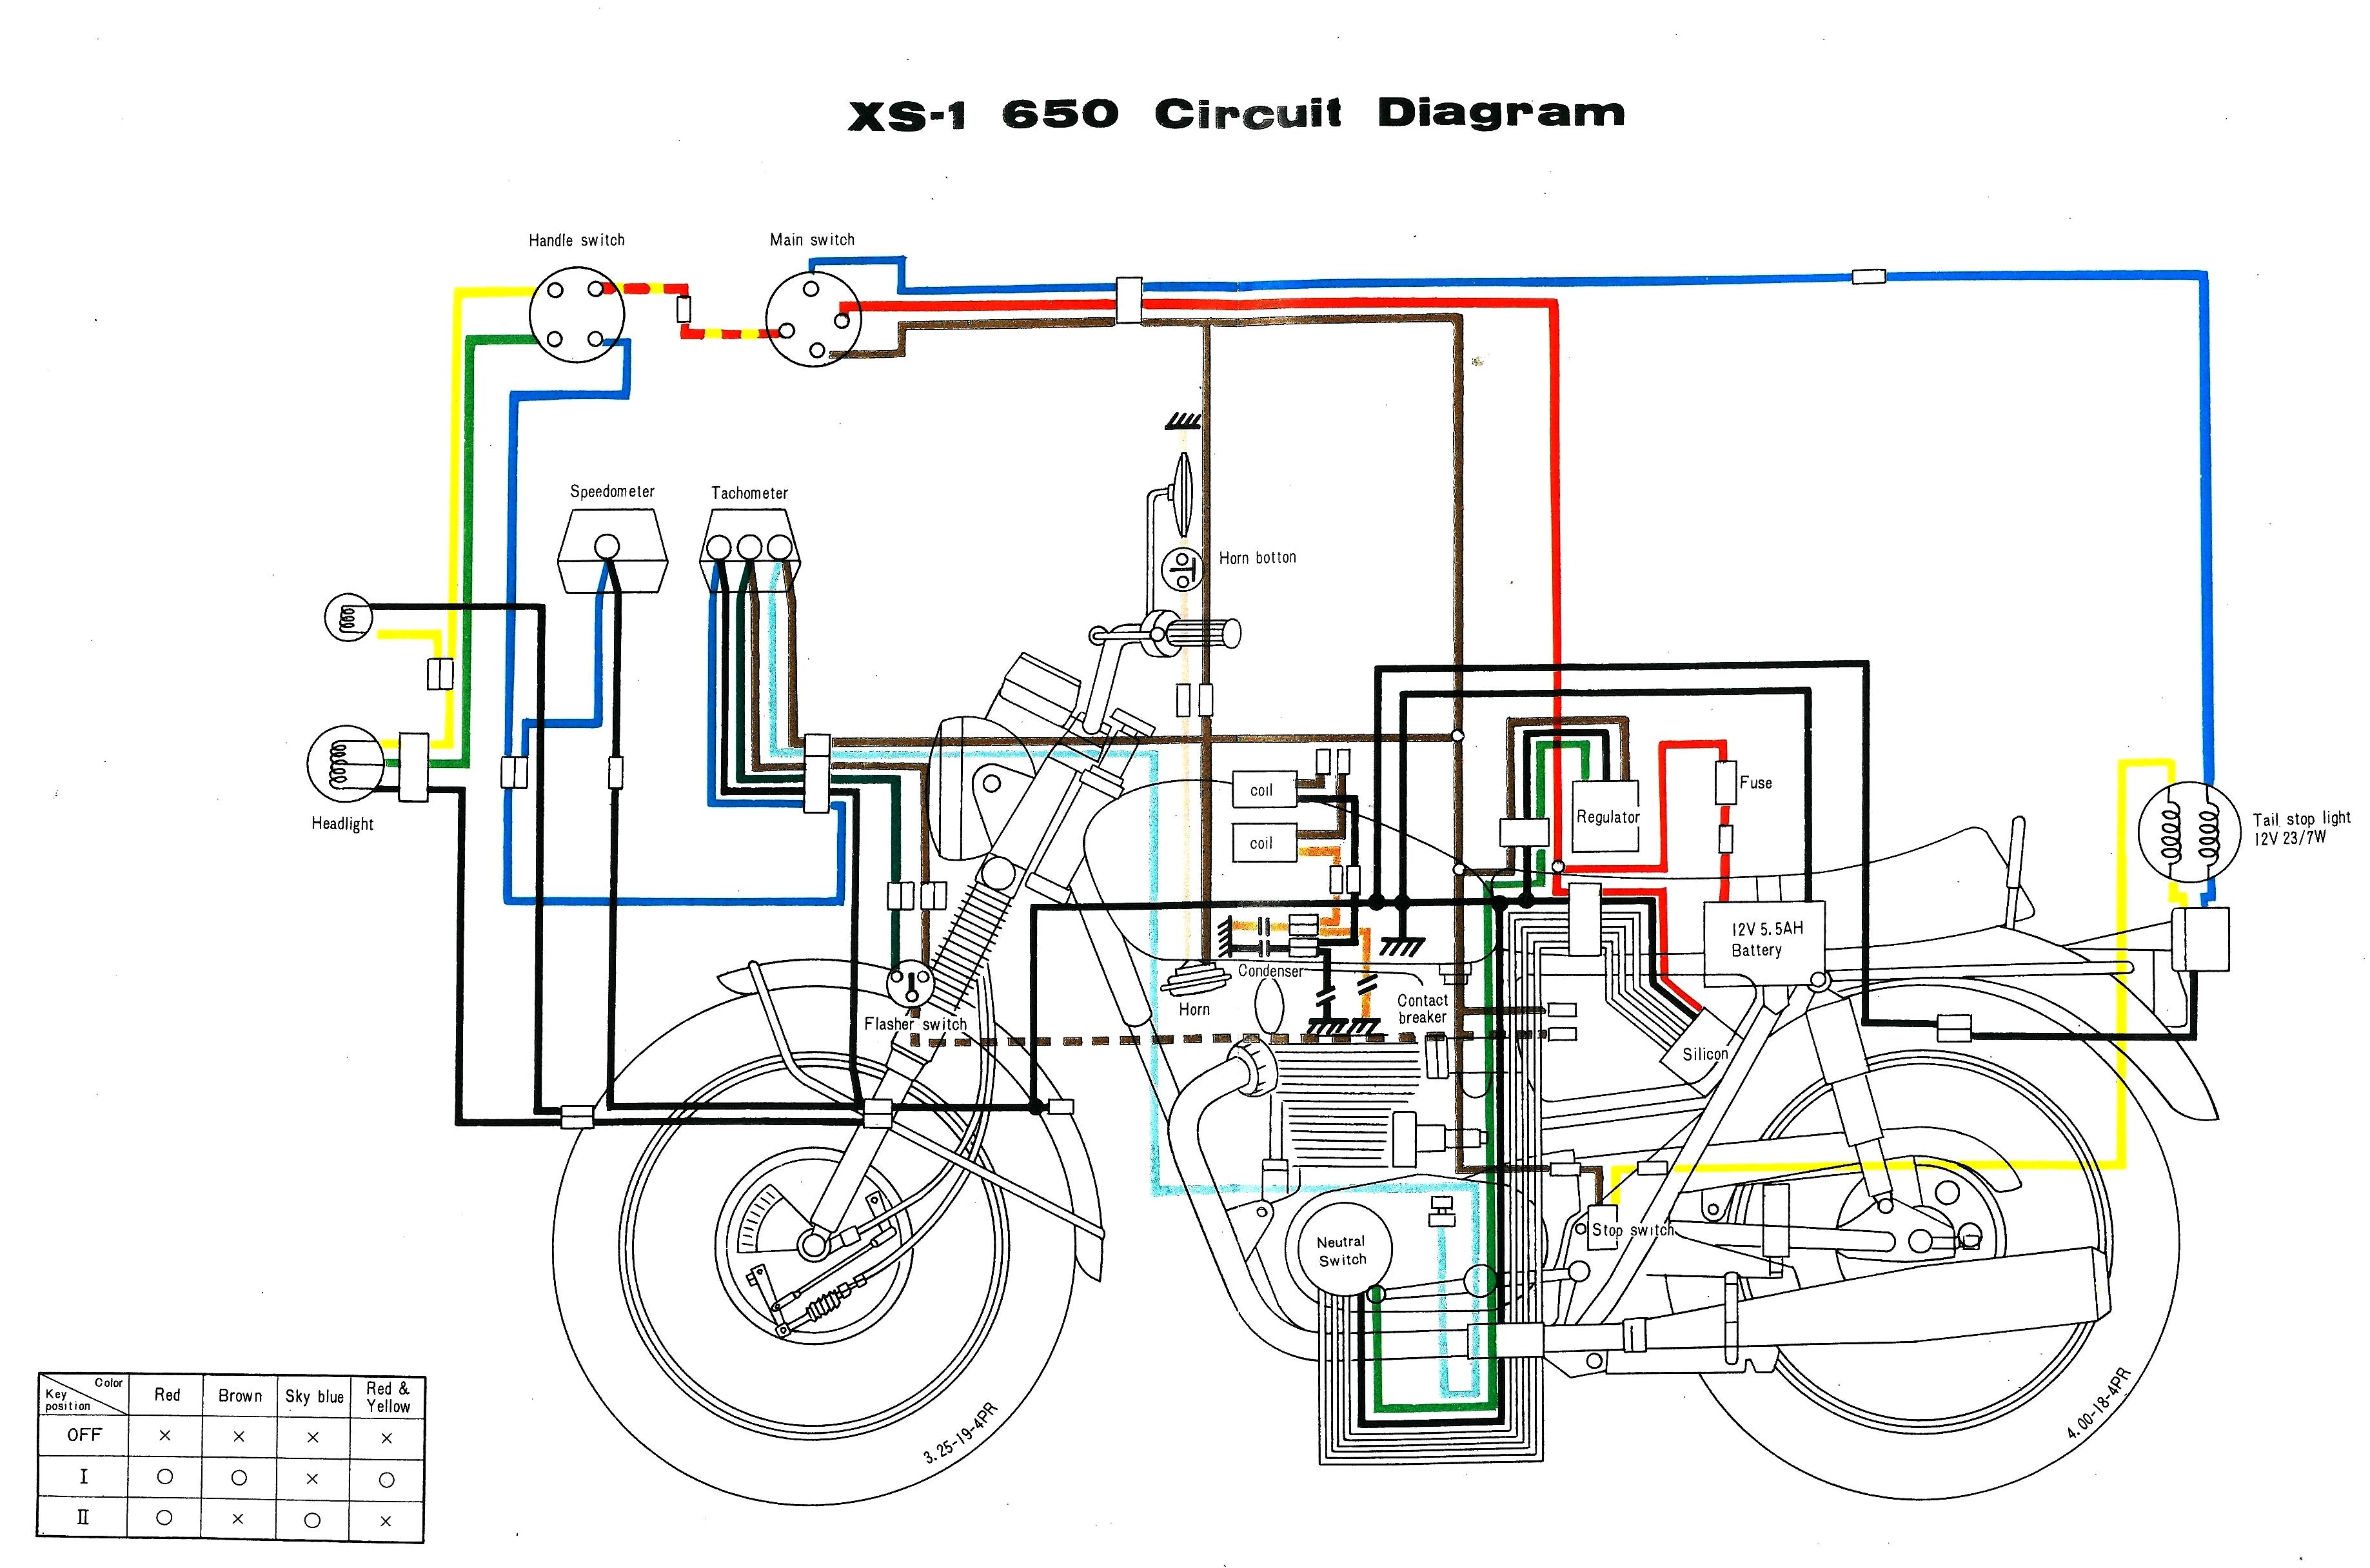 Astonishing 1974 Triumph Wiring Diagram Basic Electronics Wiring Diagram Wiring Cloud Faunaidewilluminateatxorg